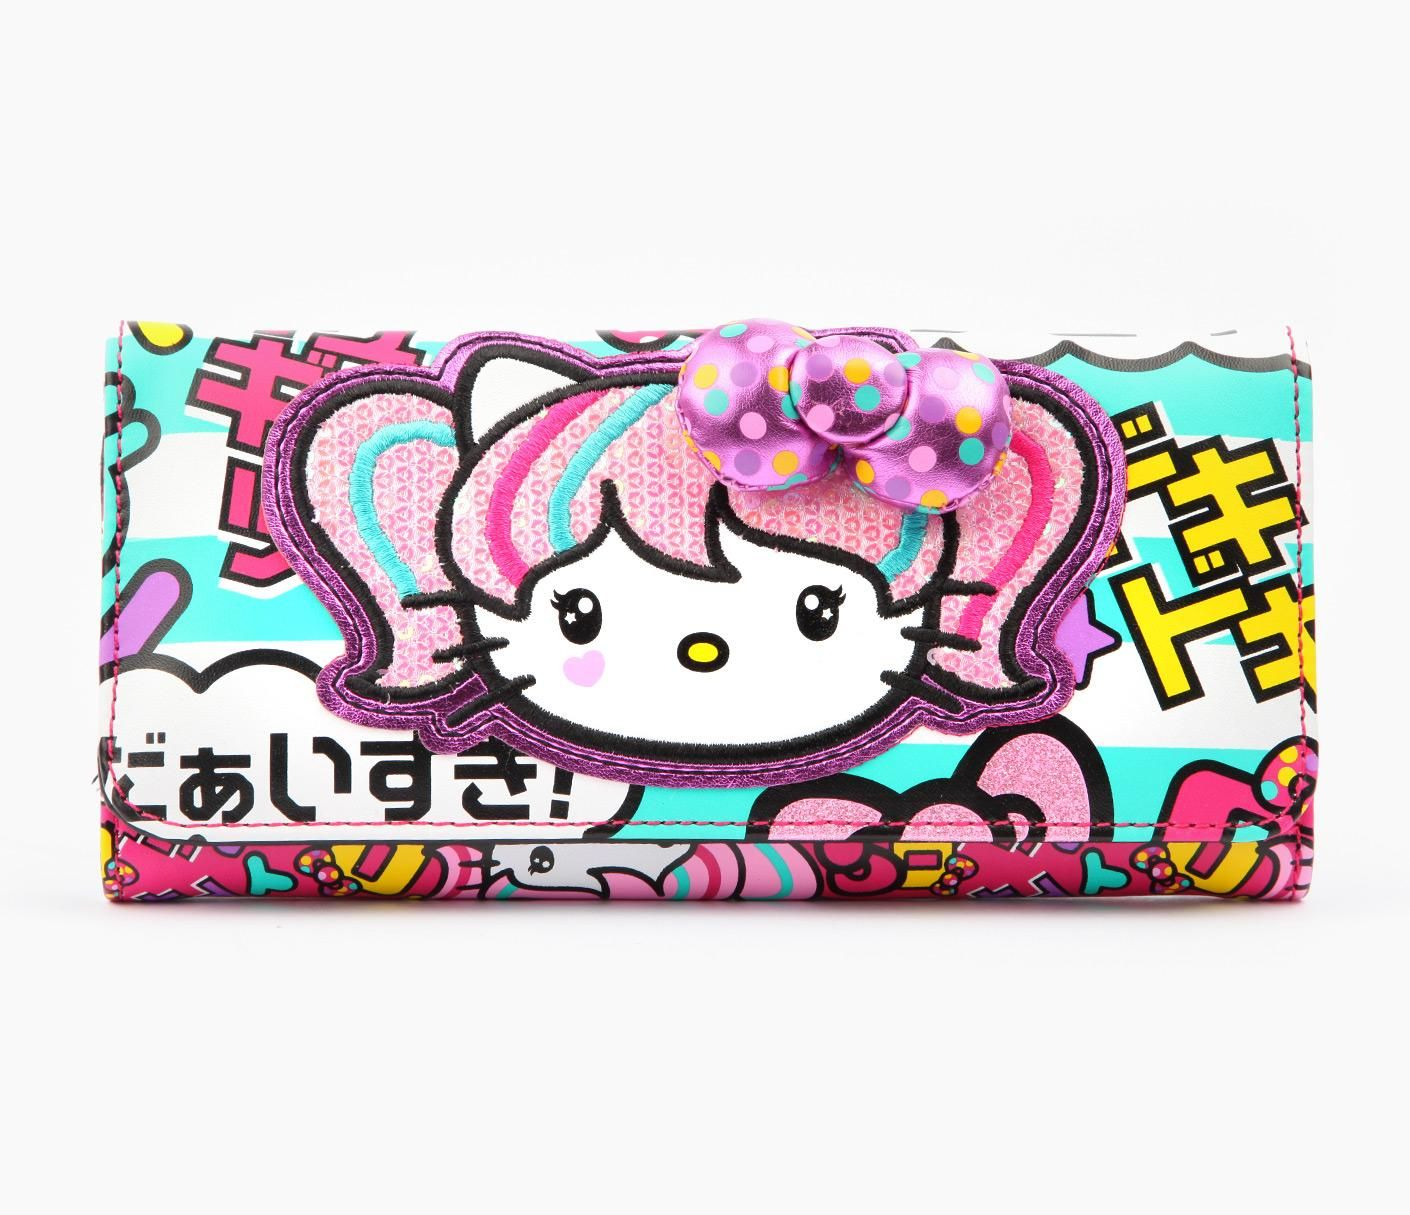 e98e50c490f0 Super kawaii Hello Kitty Japanimation wallet - hoping the sanrio shop in Vegas  has this